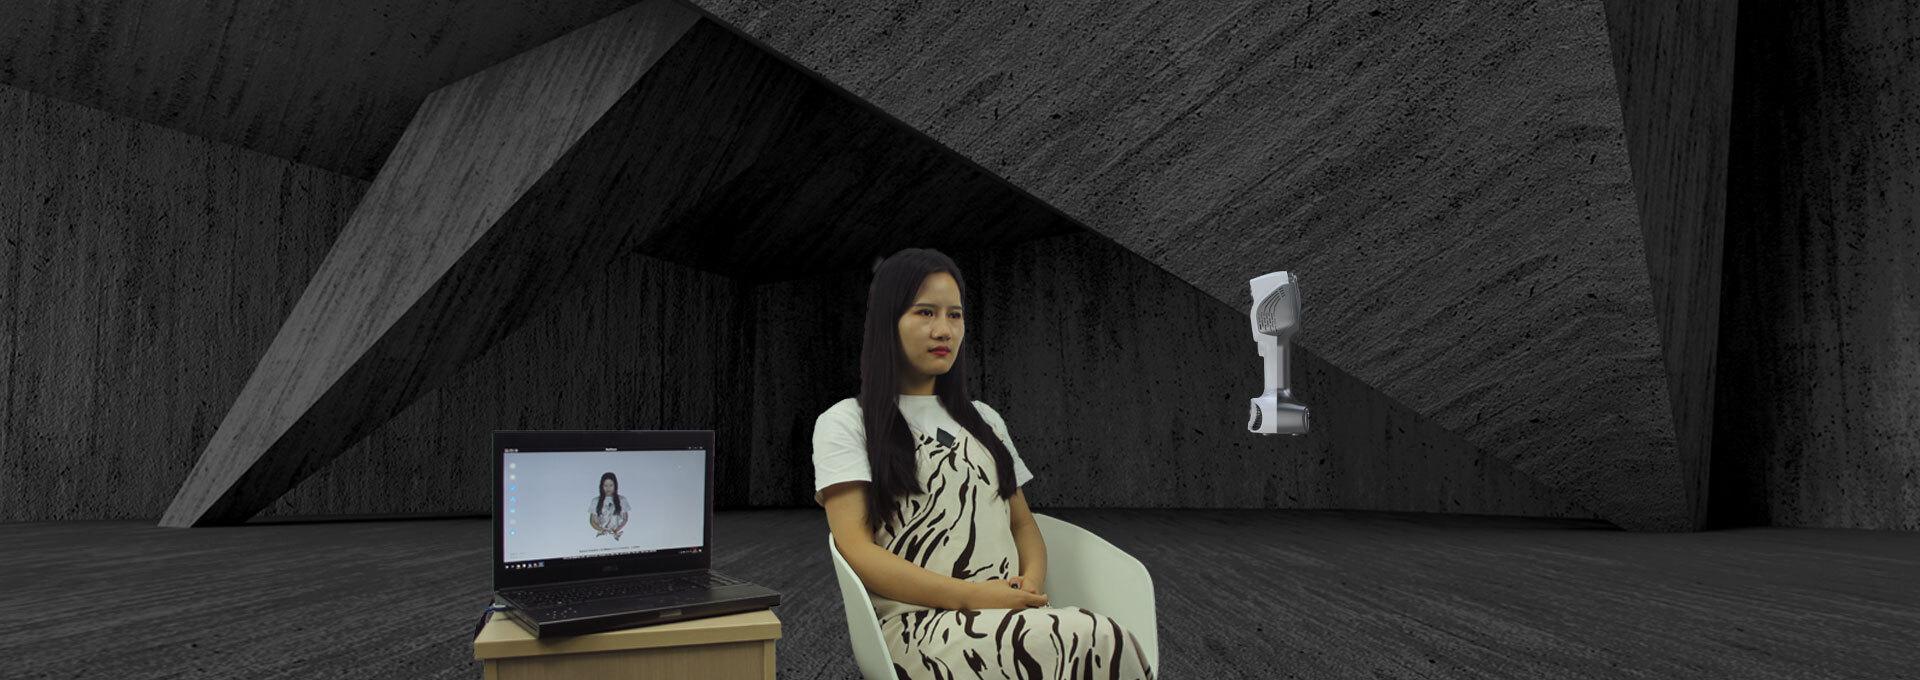 iReal 2E彩色三维扫描仪特点